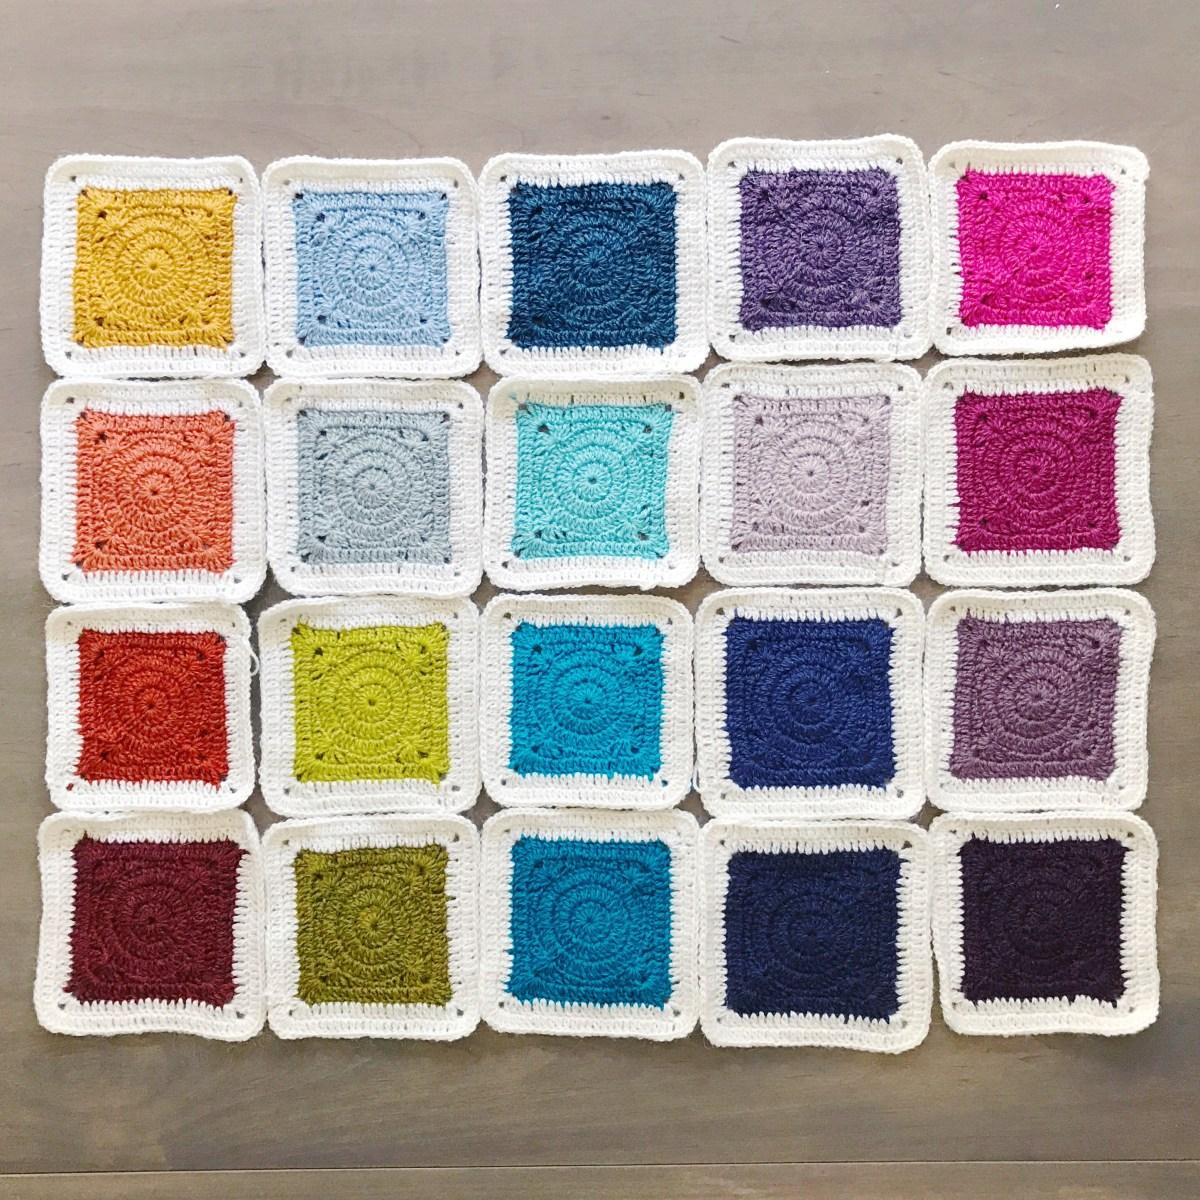 Rainbow crochet blanket